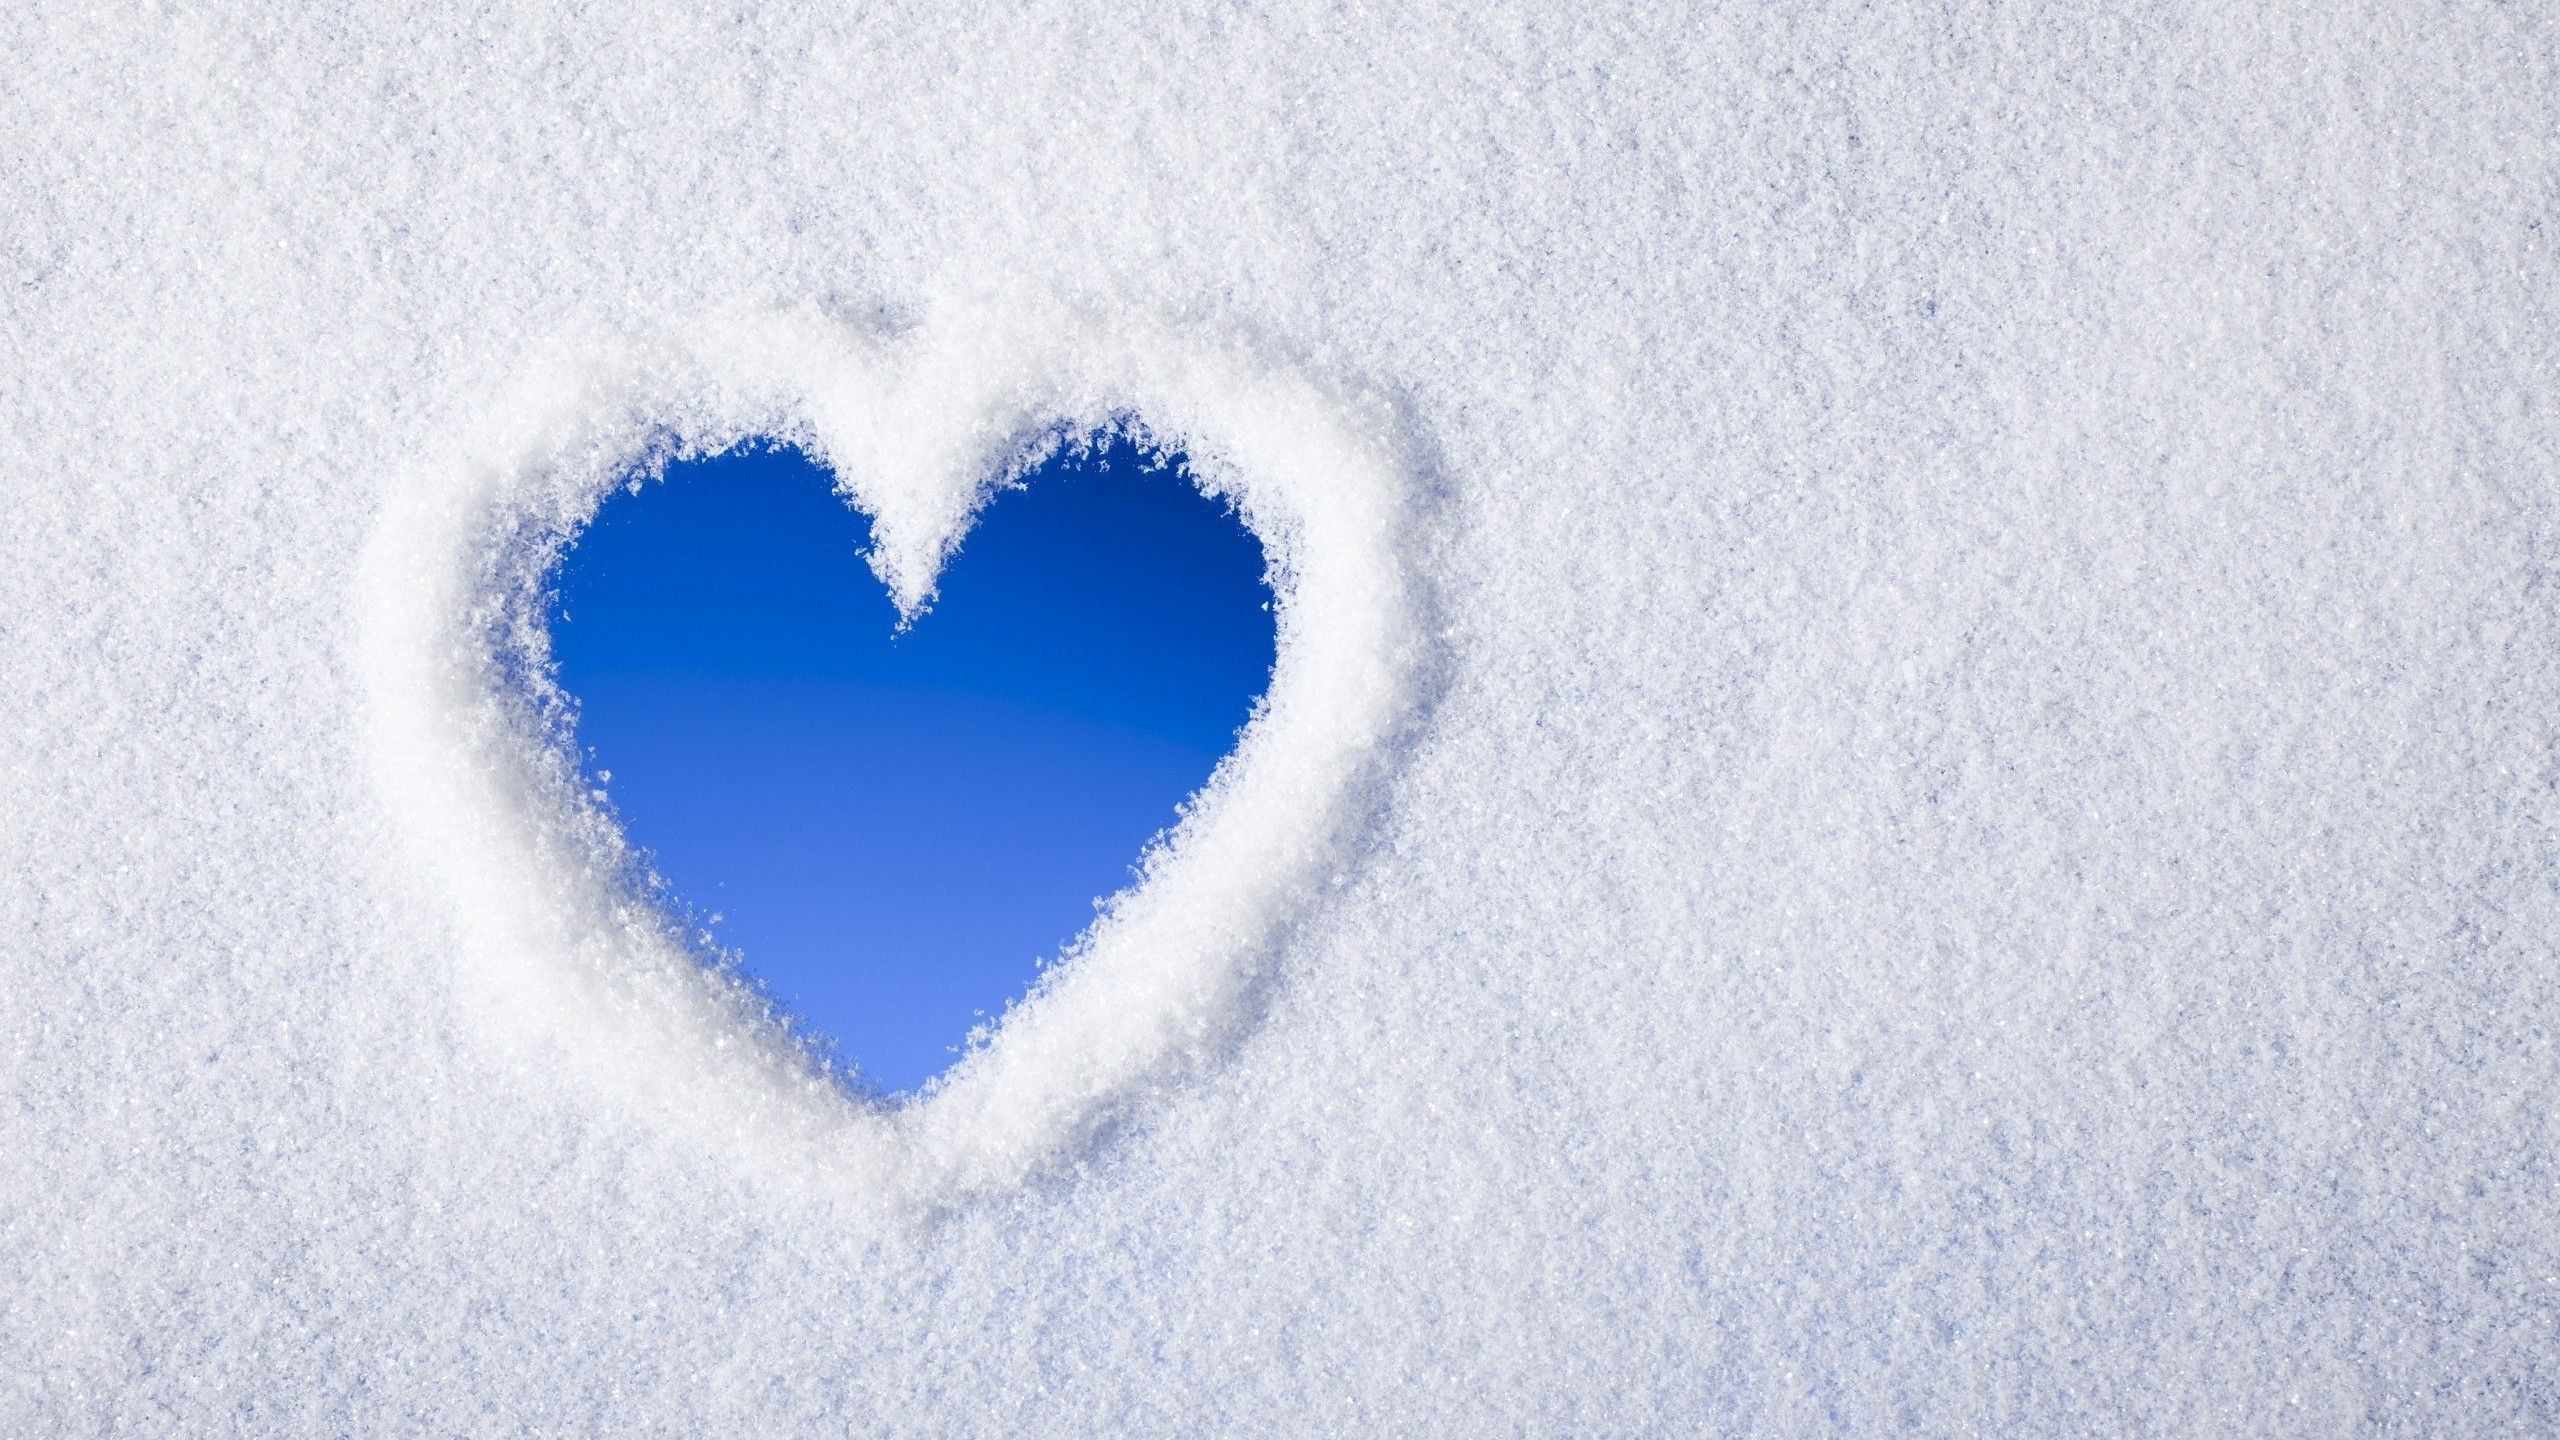 Winter Valentine , HD Wallpaper & Backgrounds